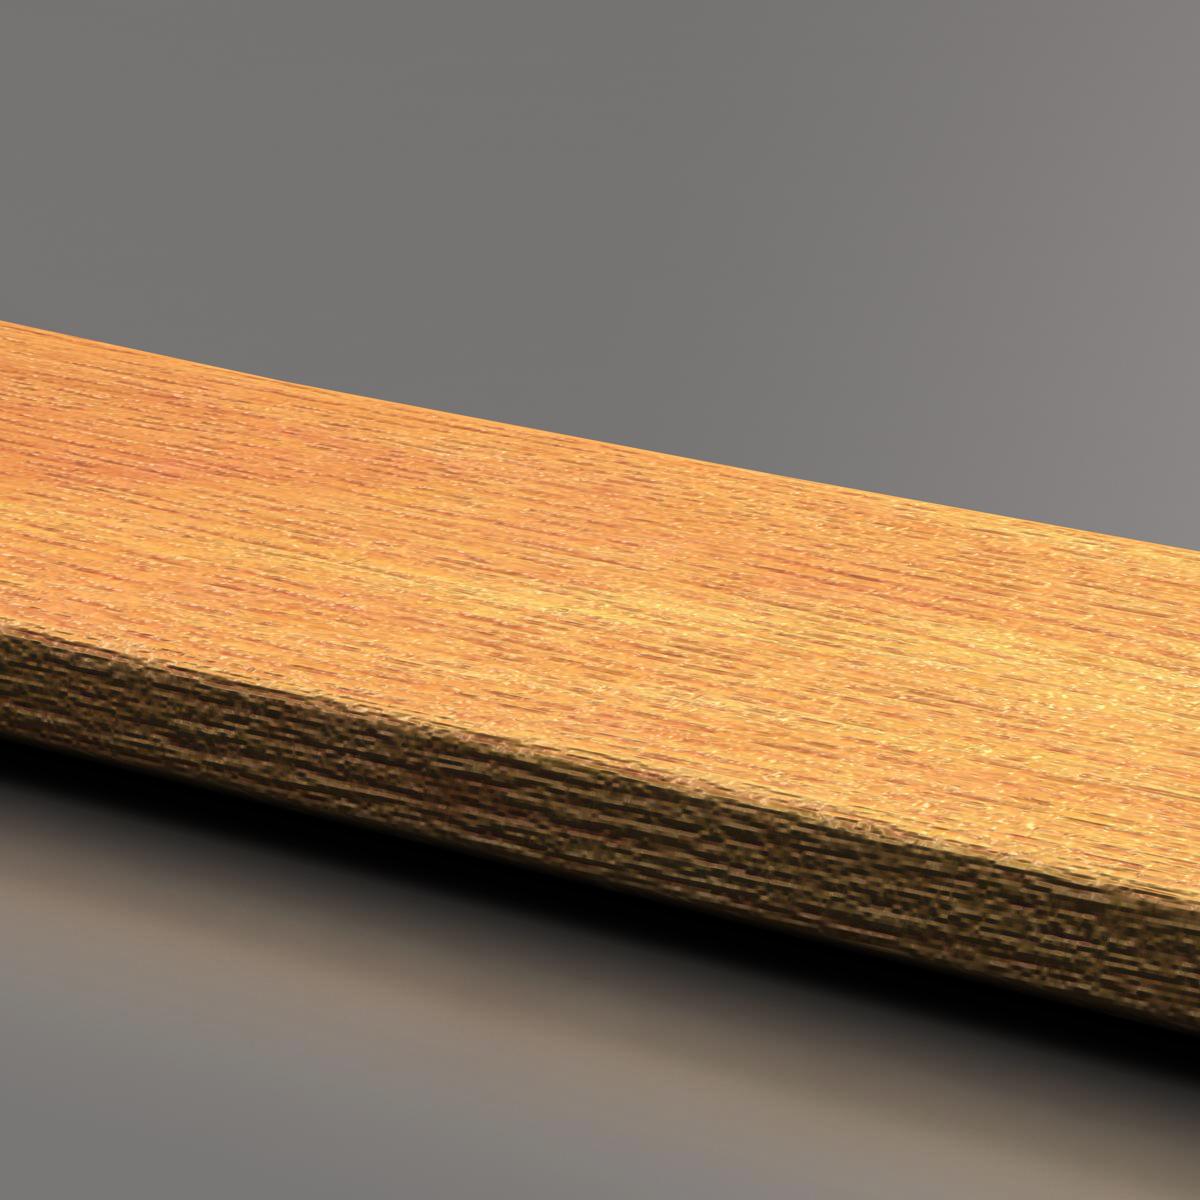 slotted spoon 3d model max fbx c4d ma mb obj 159279